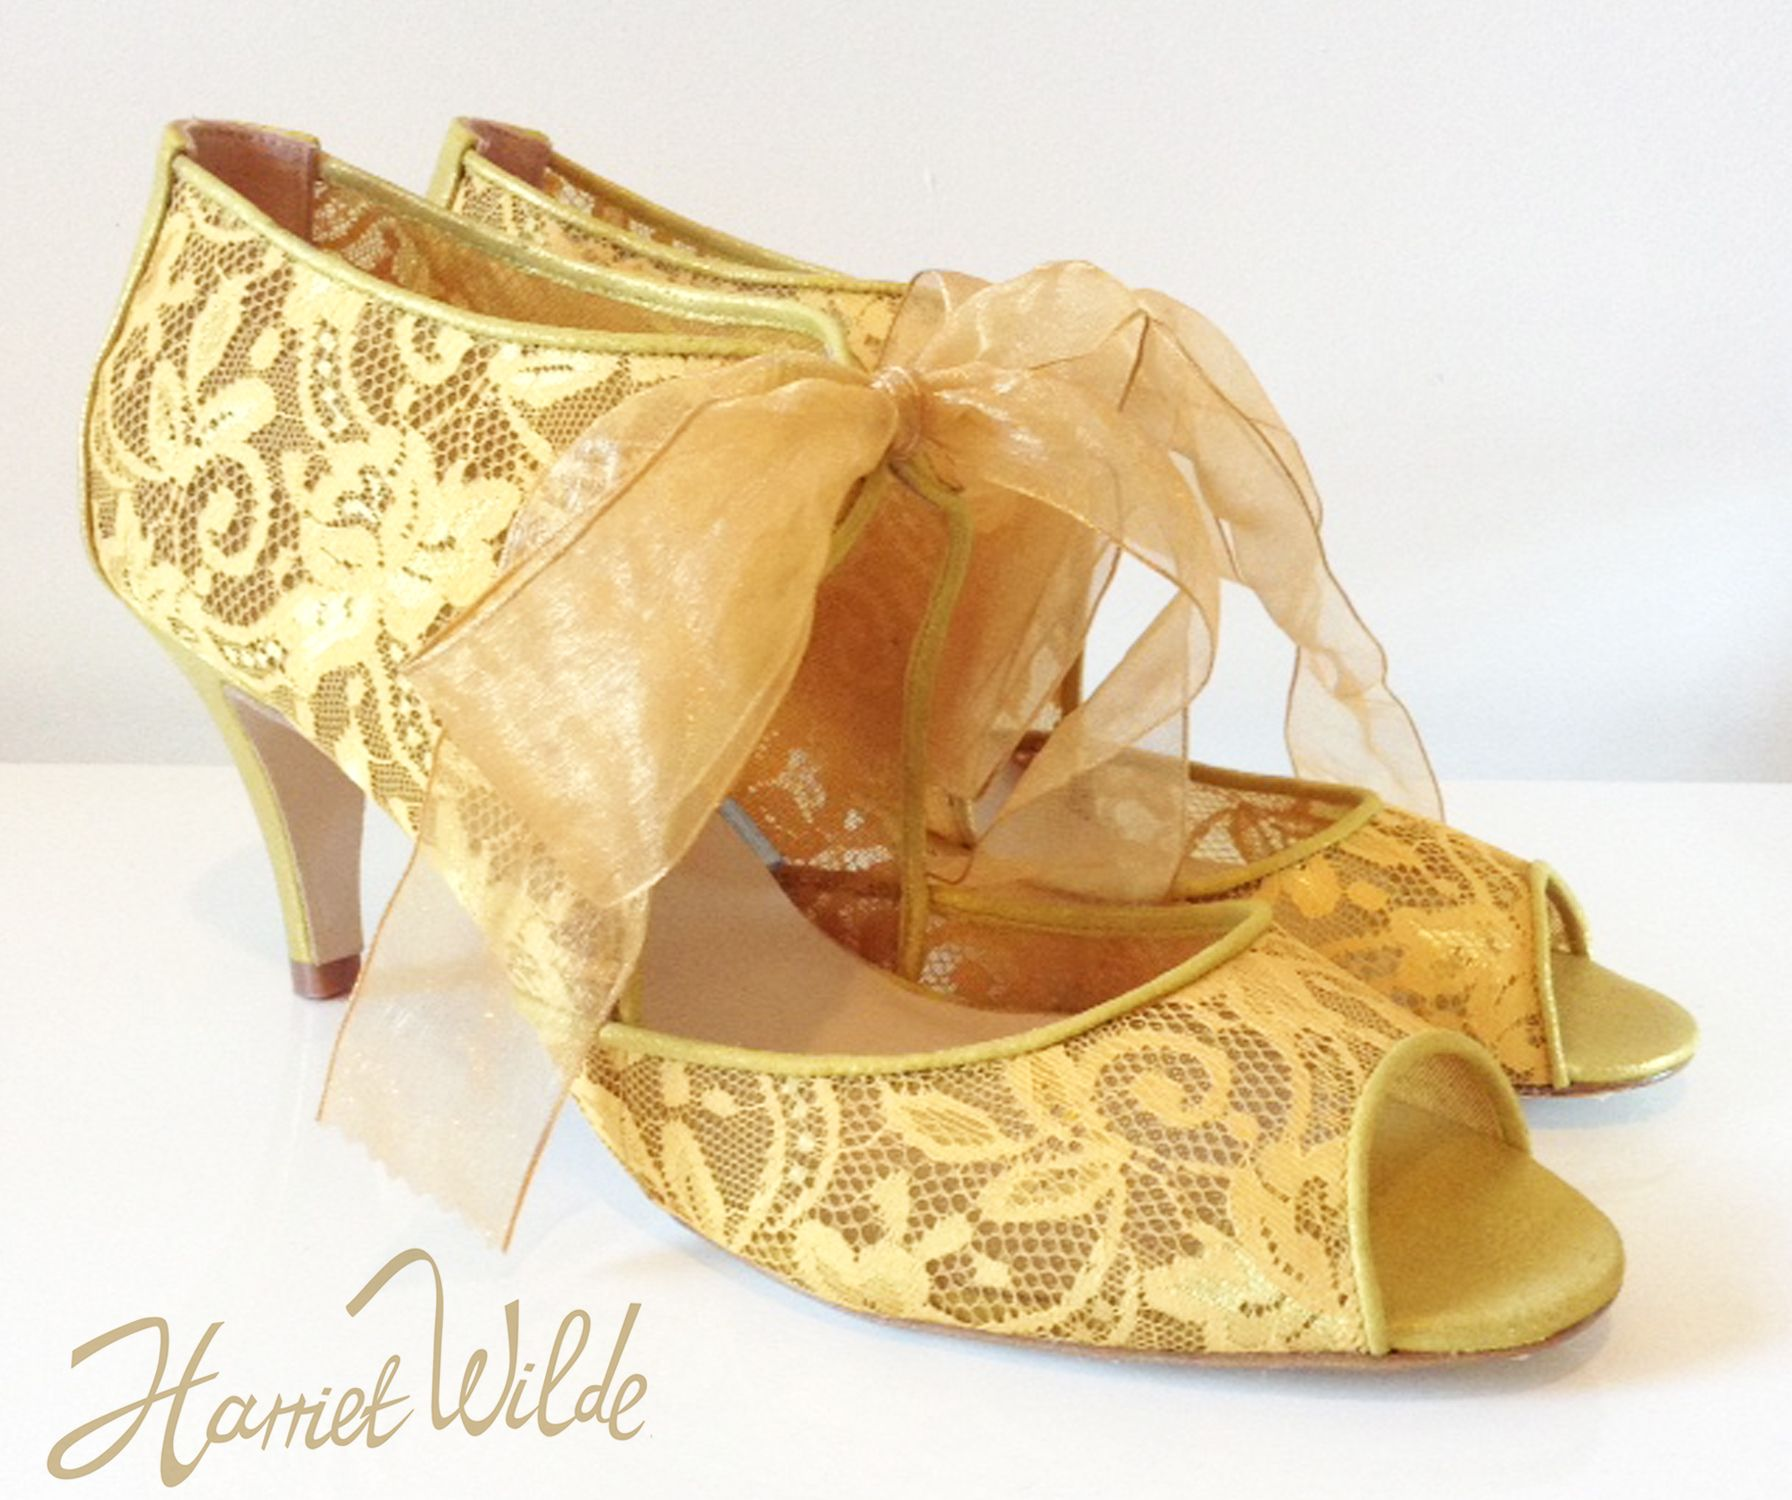 Marlow Bespoke Harriet Wilde Wedding Shoes Price On Request Visit Www Harrietwilde